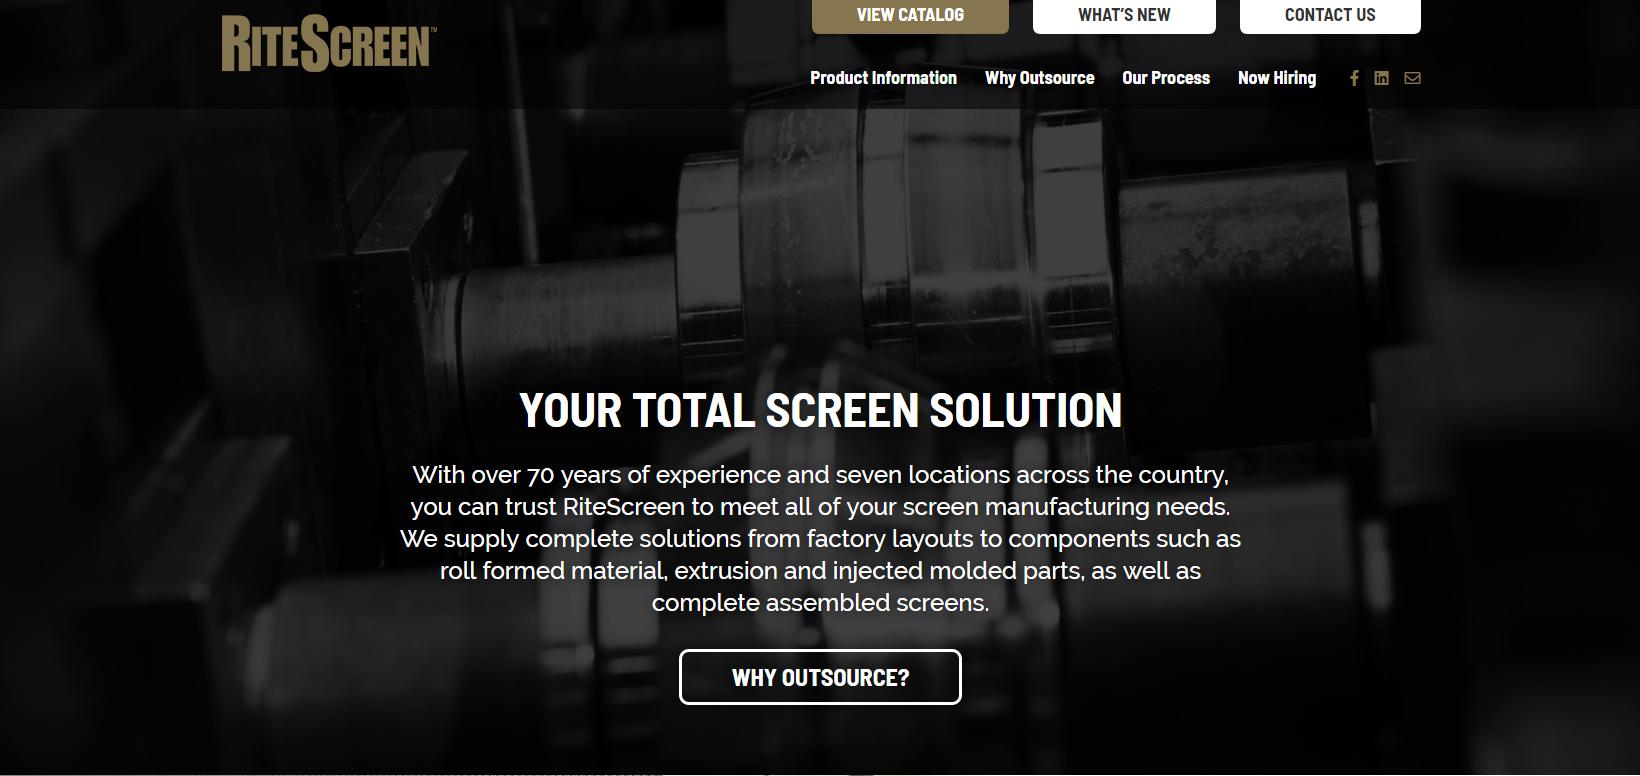 RiteScreen